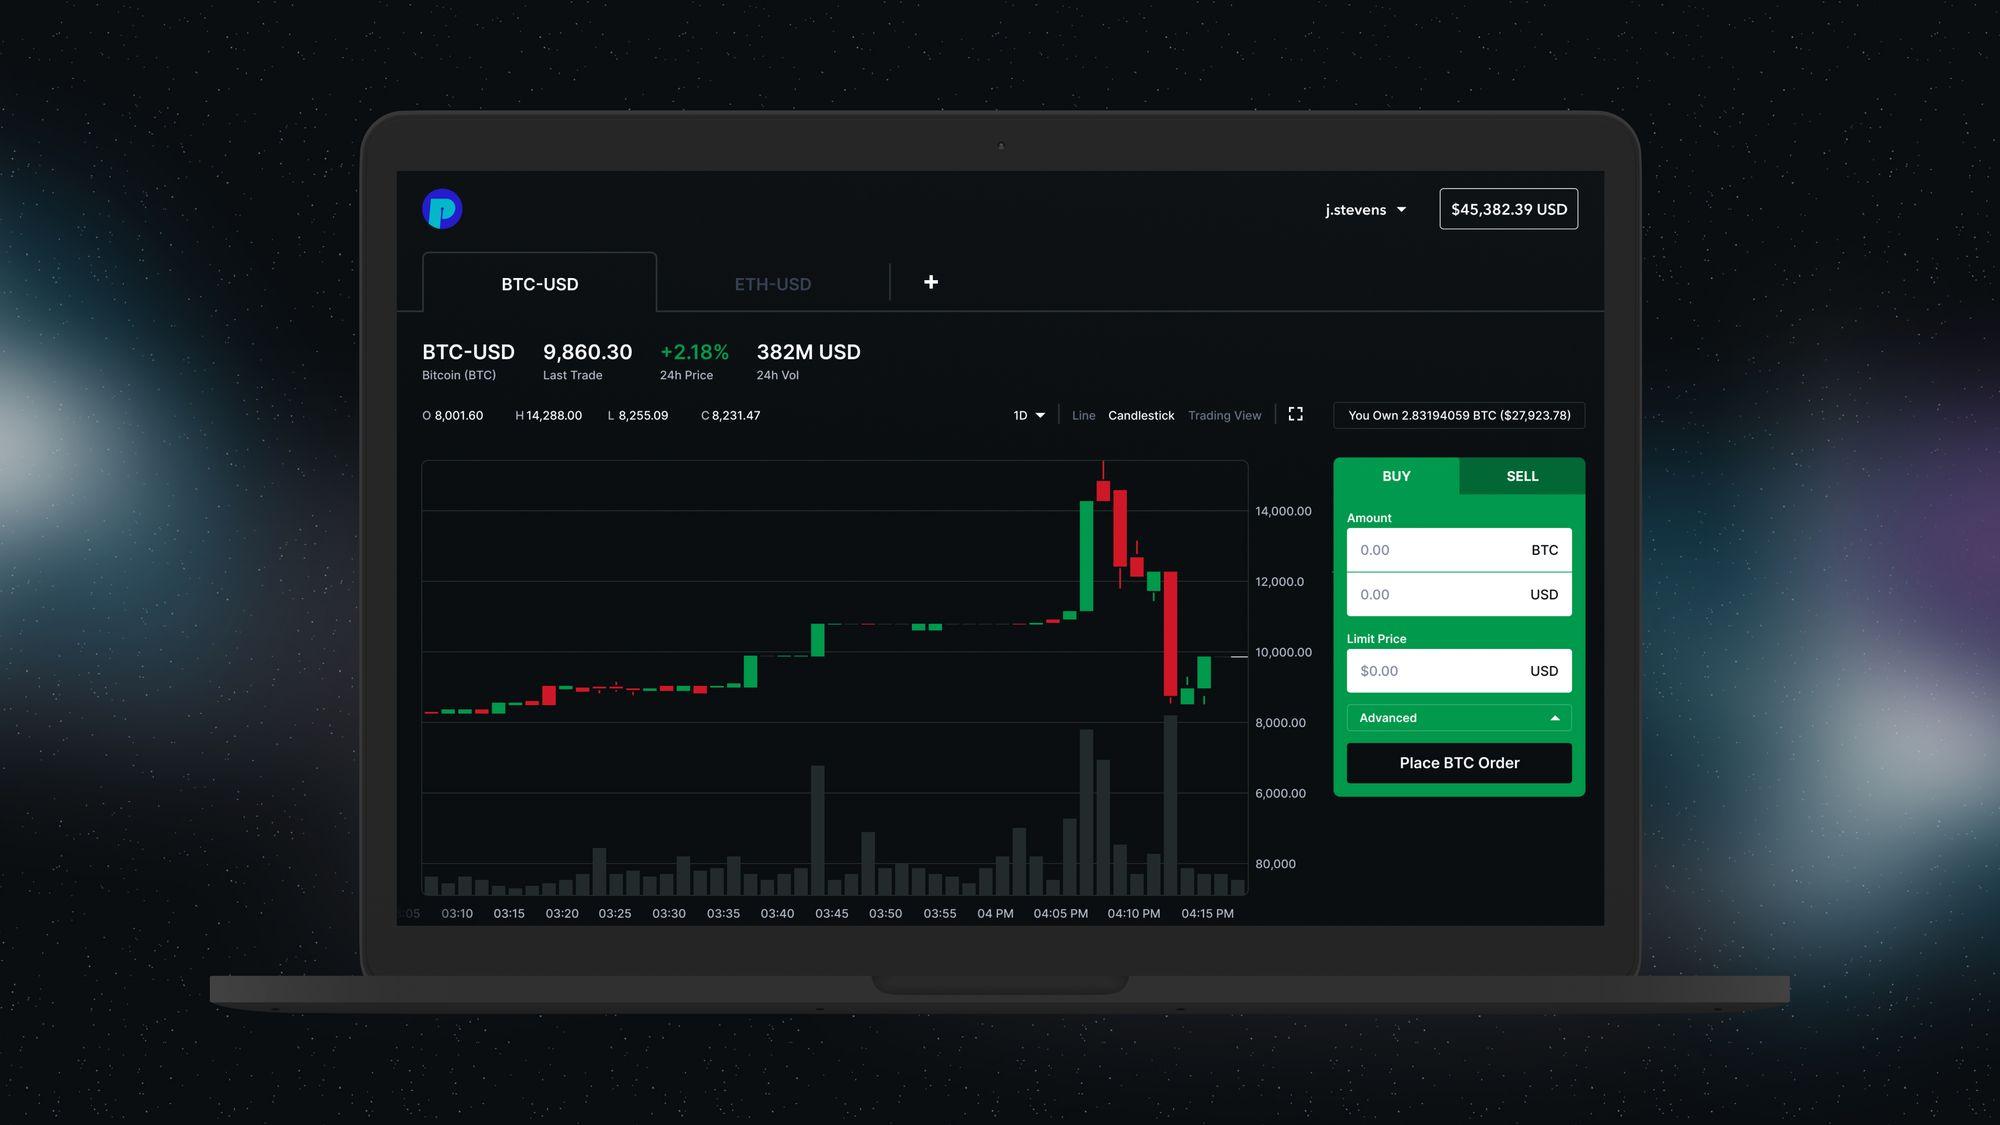 Wallet-Provider Blockchain startet eigene Kryptobörse The Pit